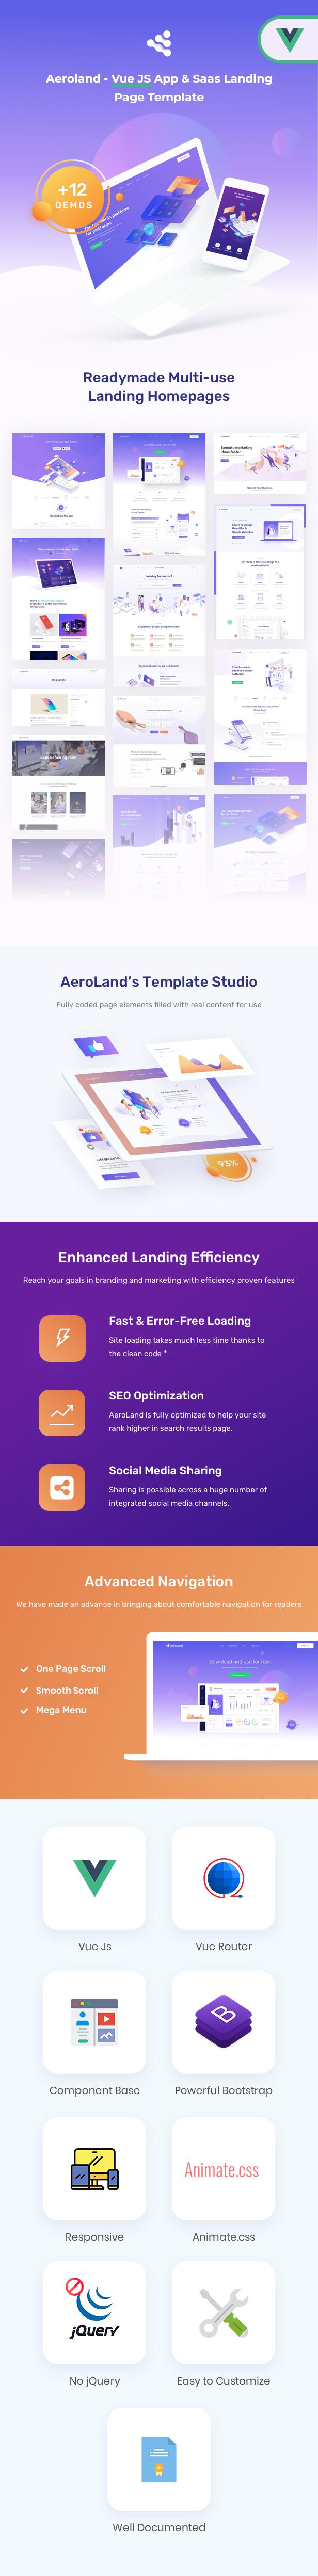 Aeroland - Vue JS App & Saas Landing Page Template - 1